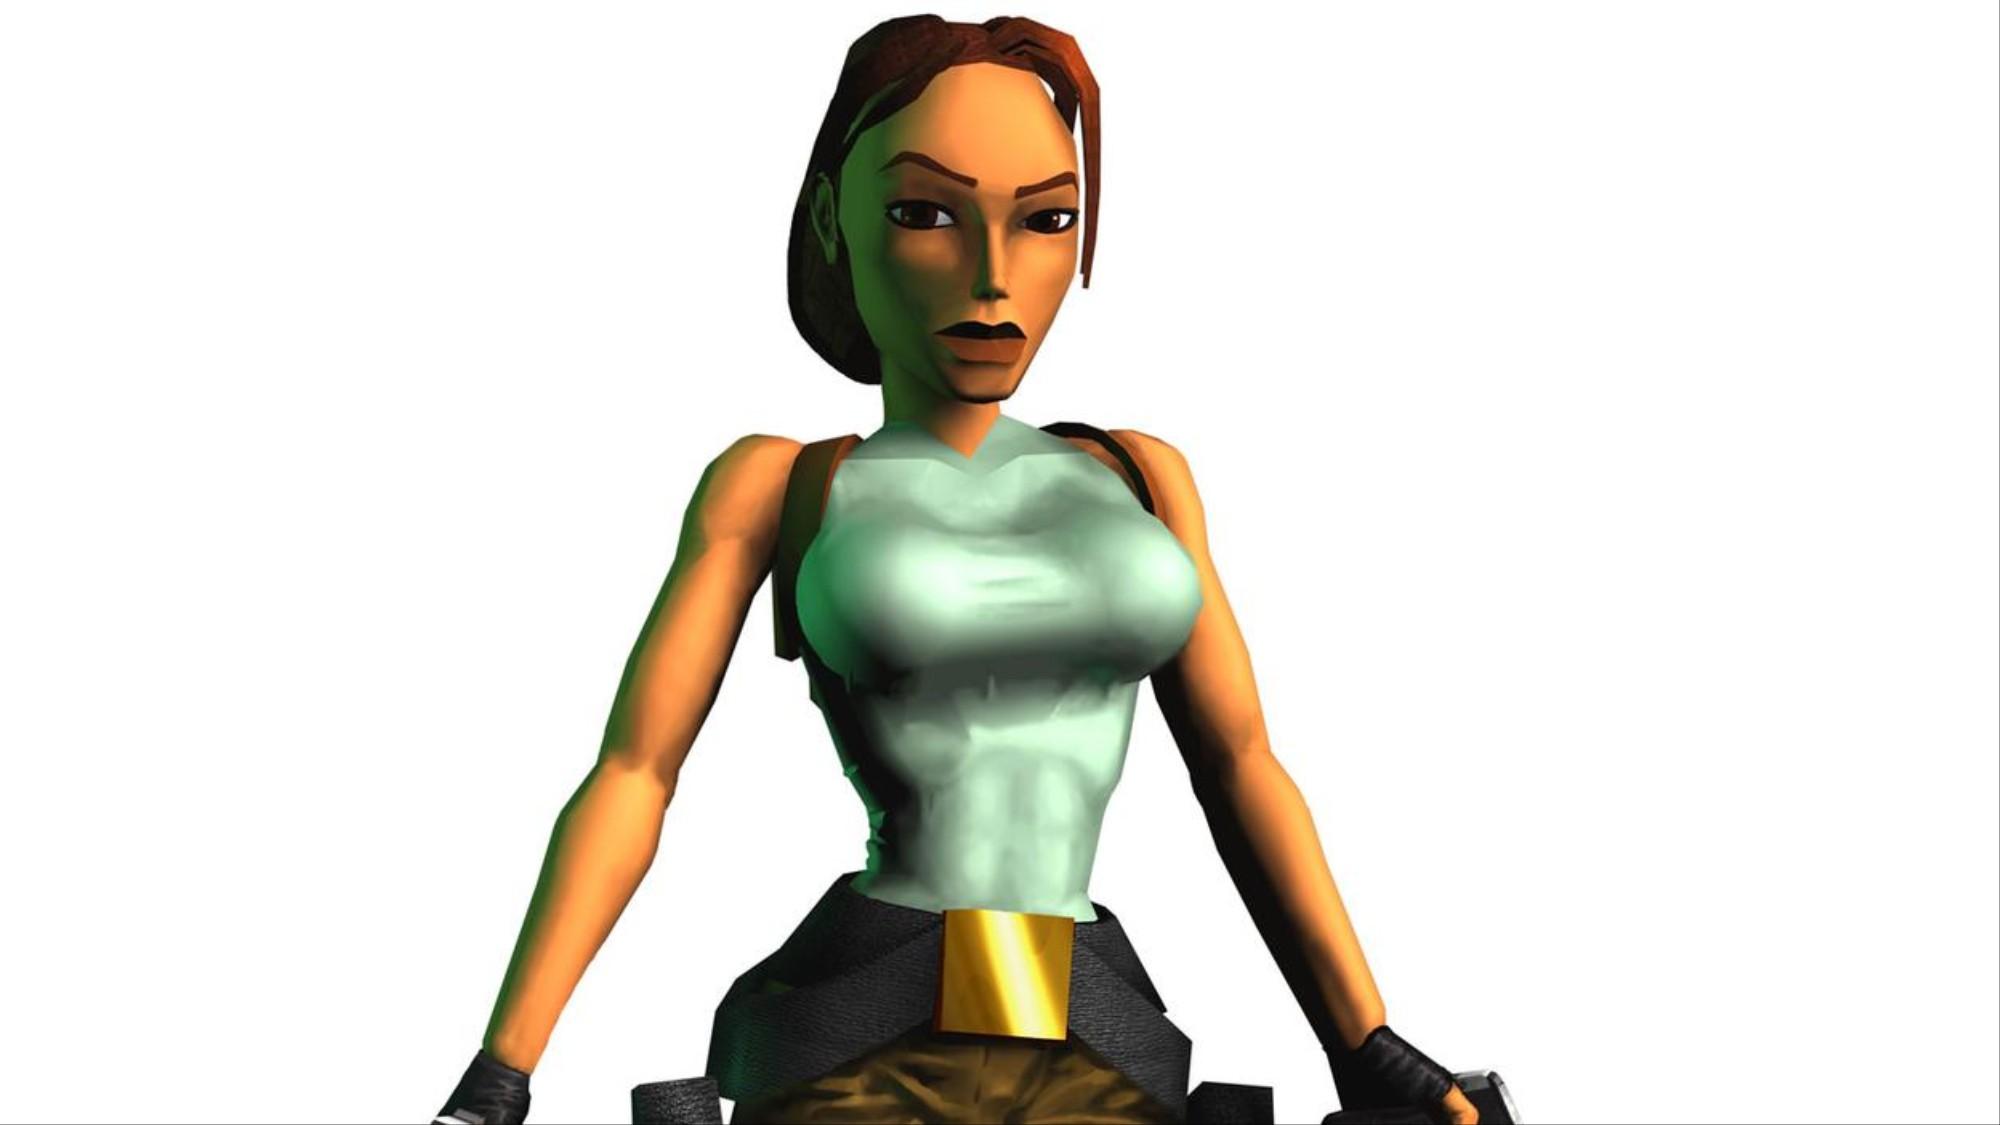 Lara Croft Feminist Hero Or Just Another Male Fantasy I D